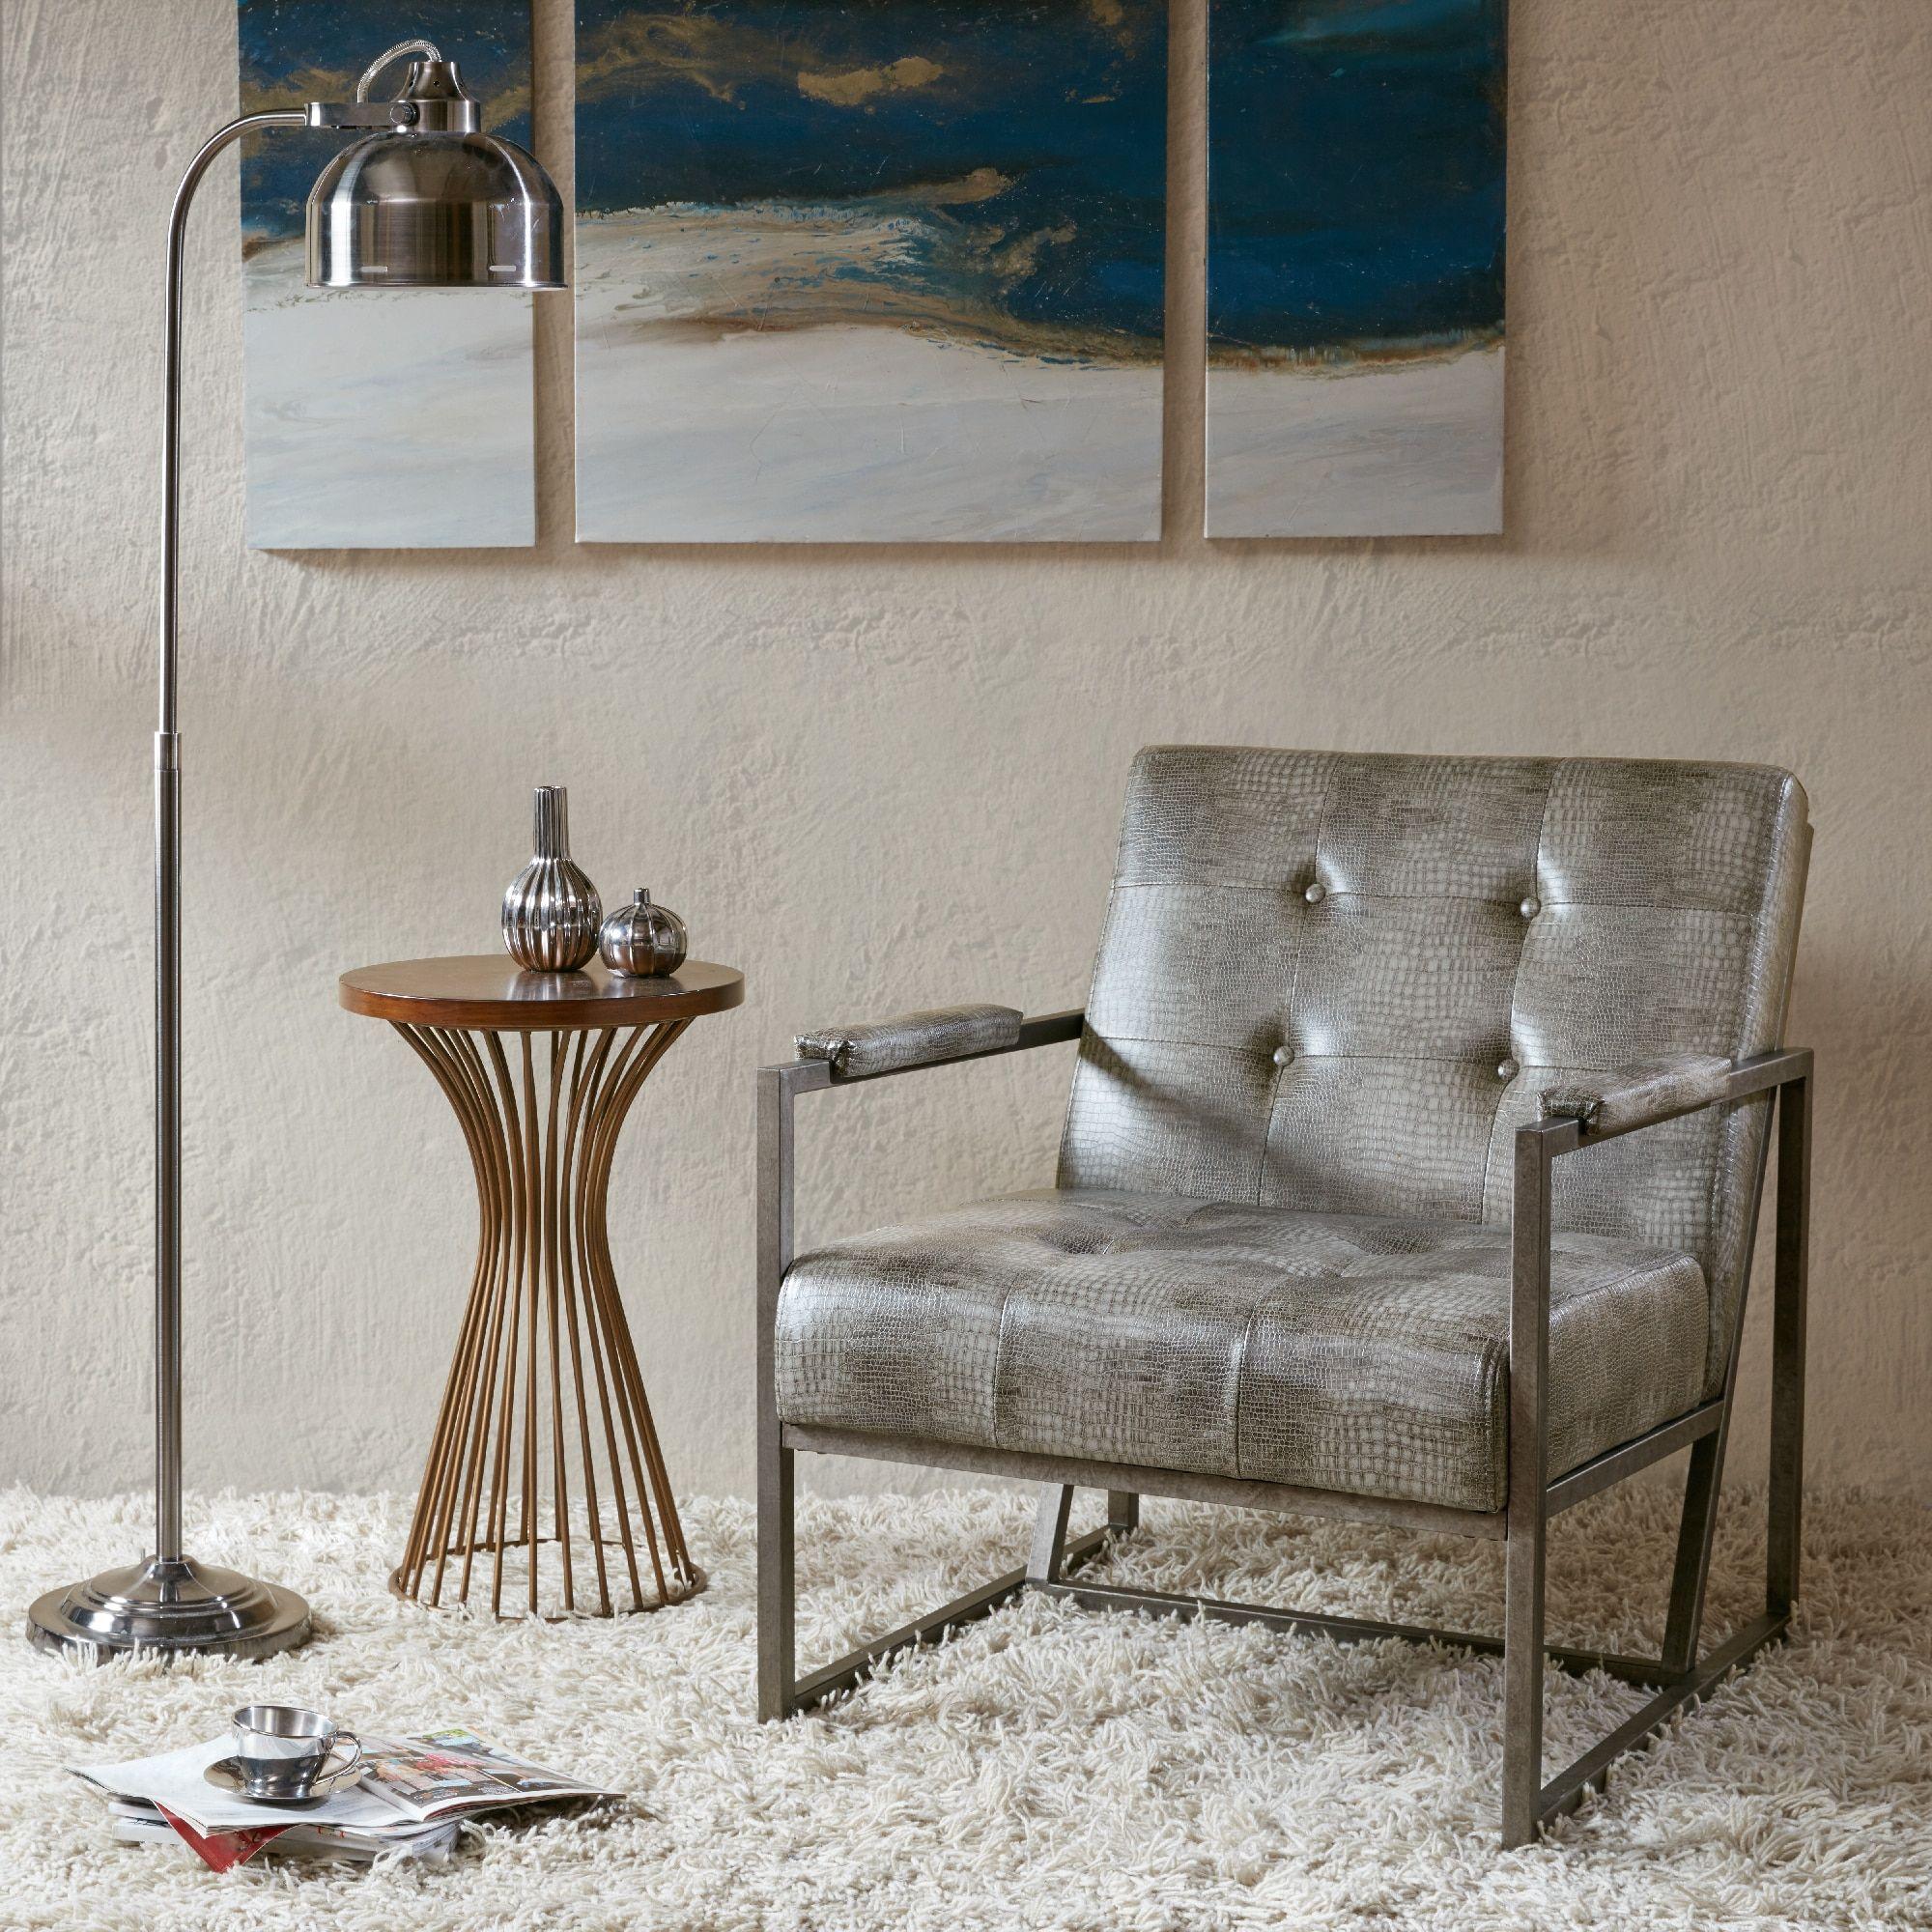 Astonishing Strick Bolton Normani Brown Faux Leather Metal Frame Inzonedesignstudio Interior Chair Design Inzonedesignstudiocom